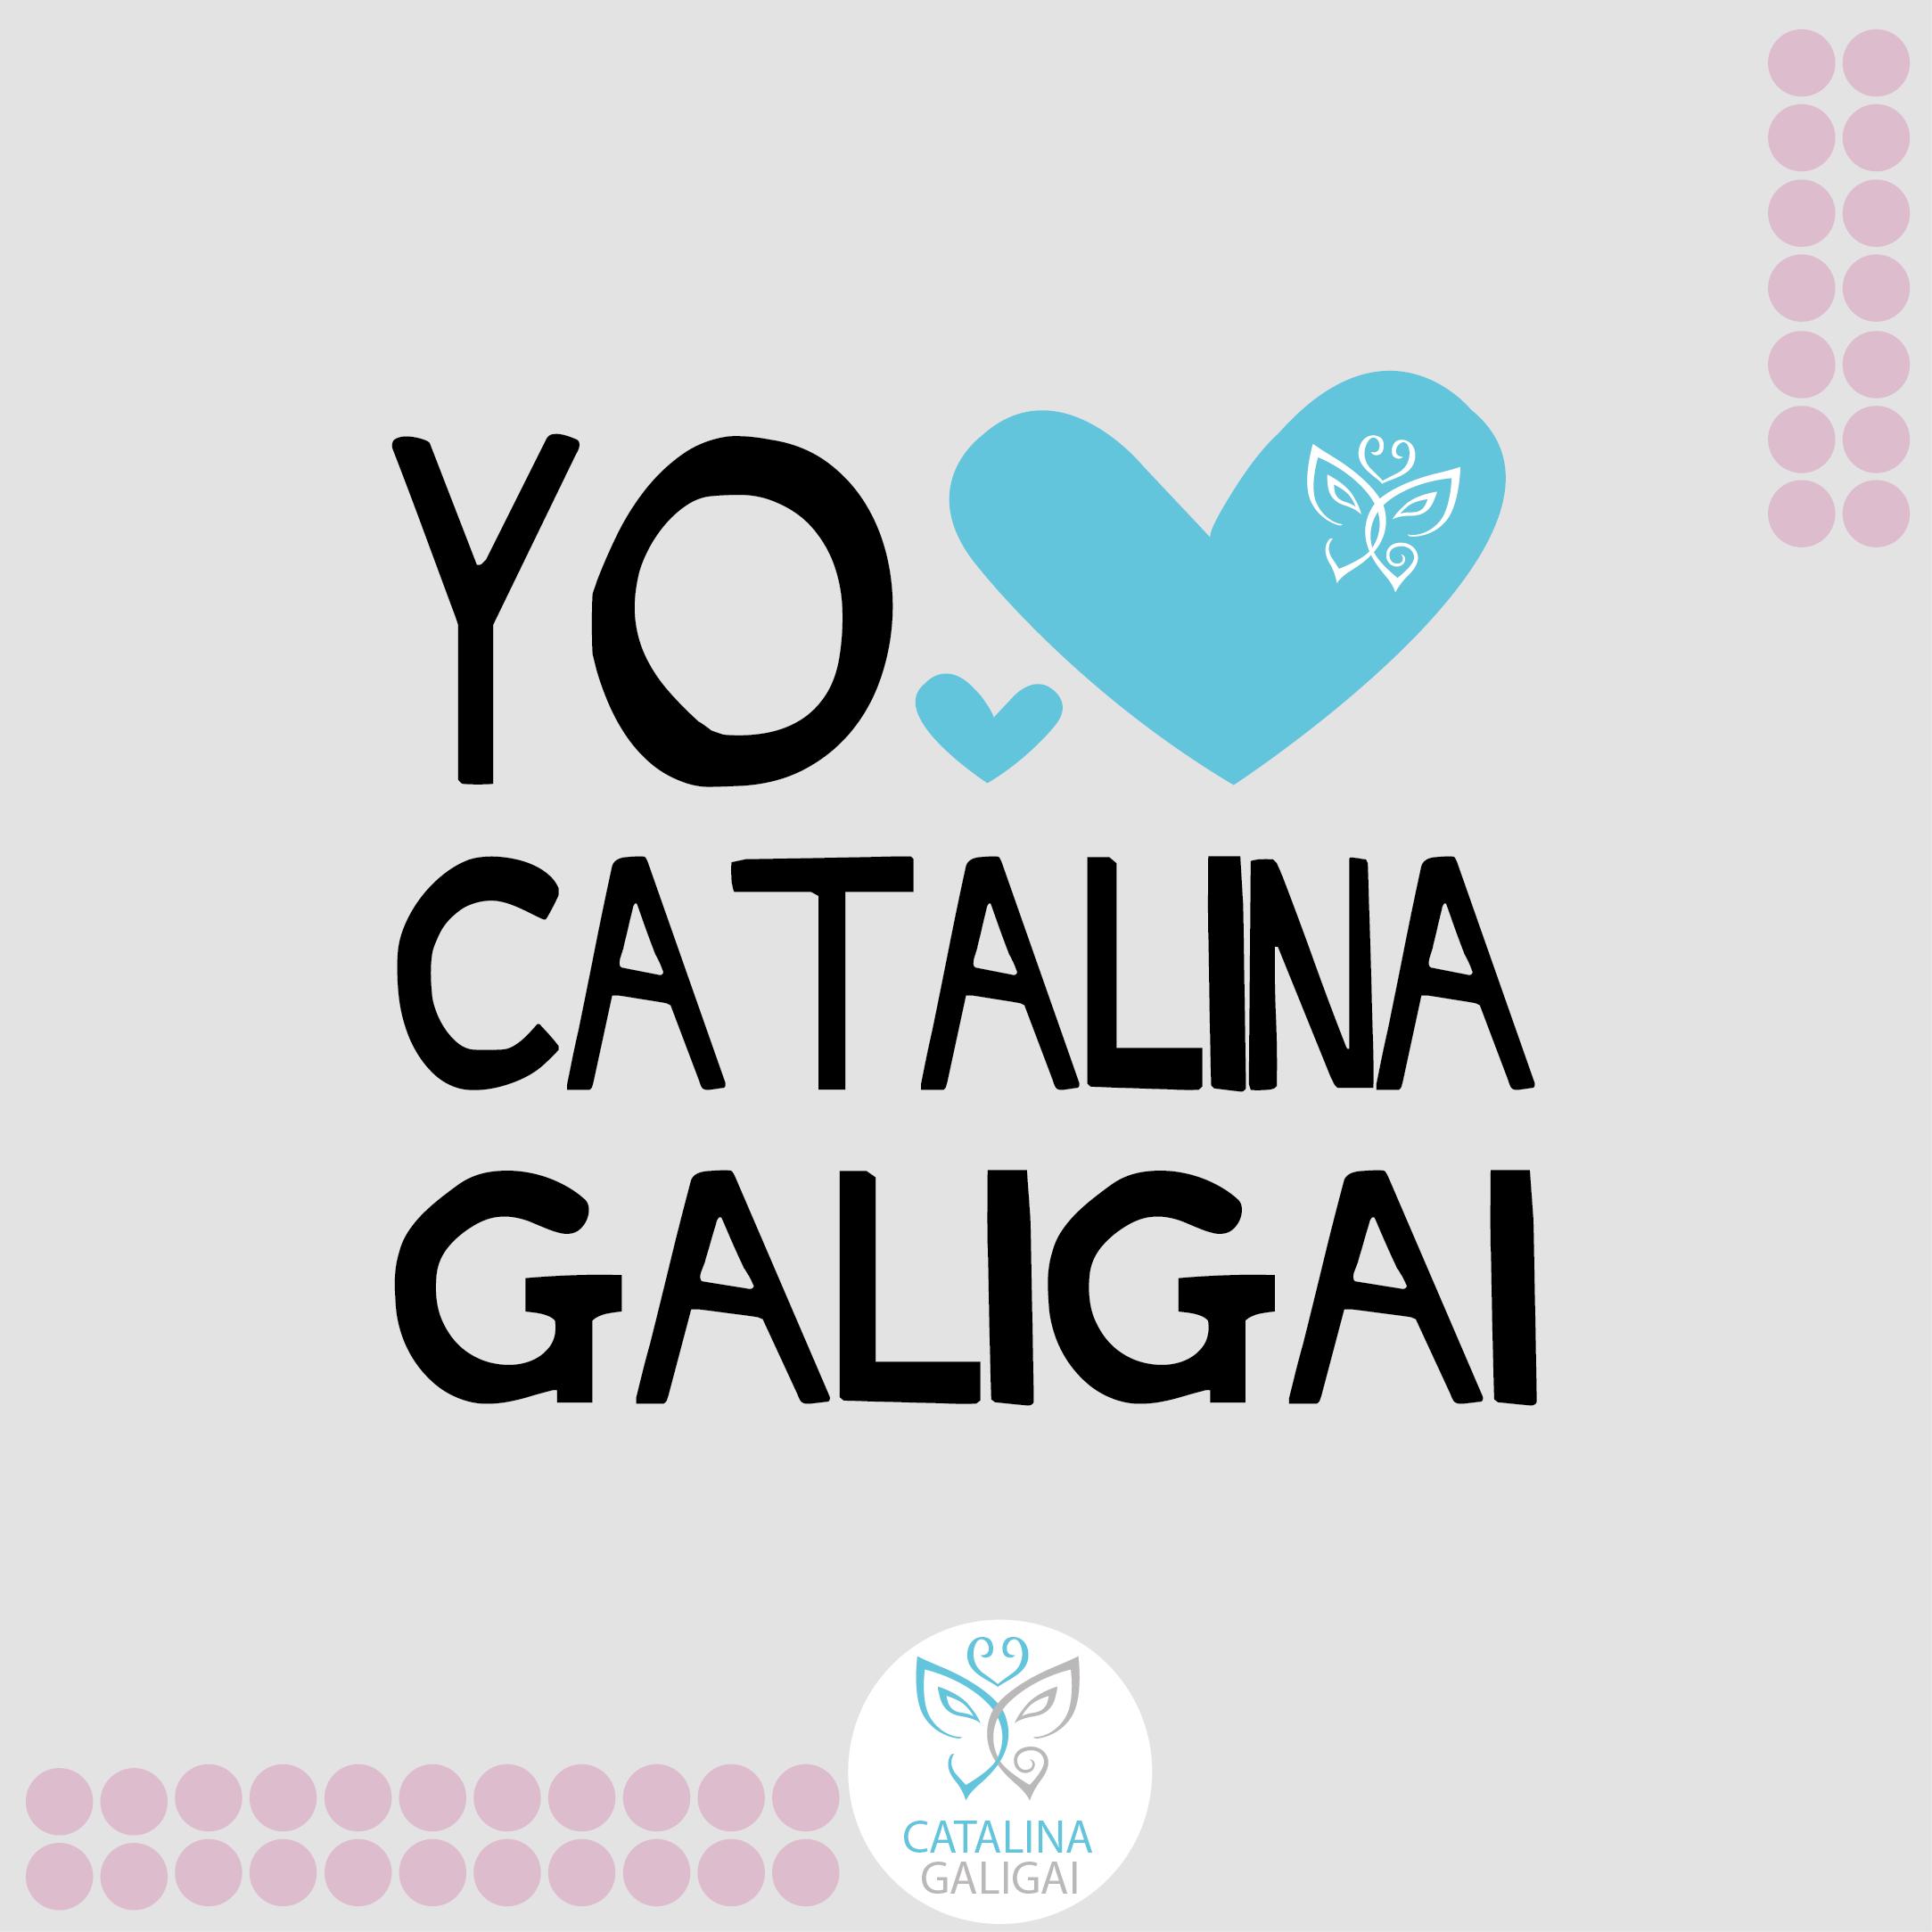 #CatalinaGaligai les desea una excelente semana  !!